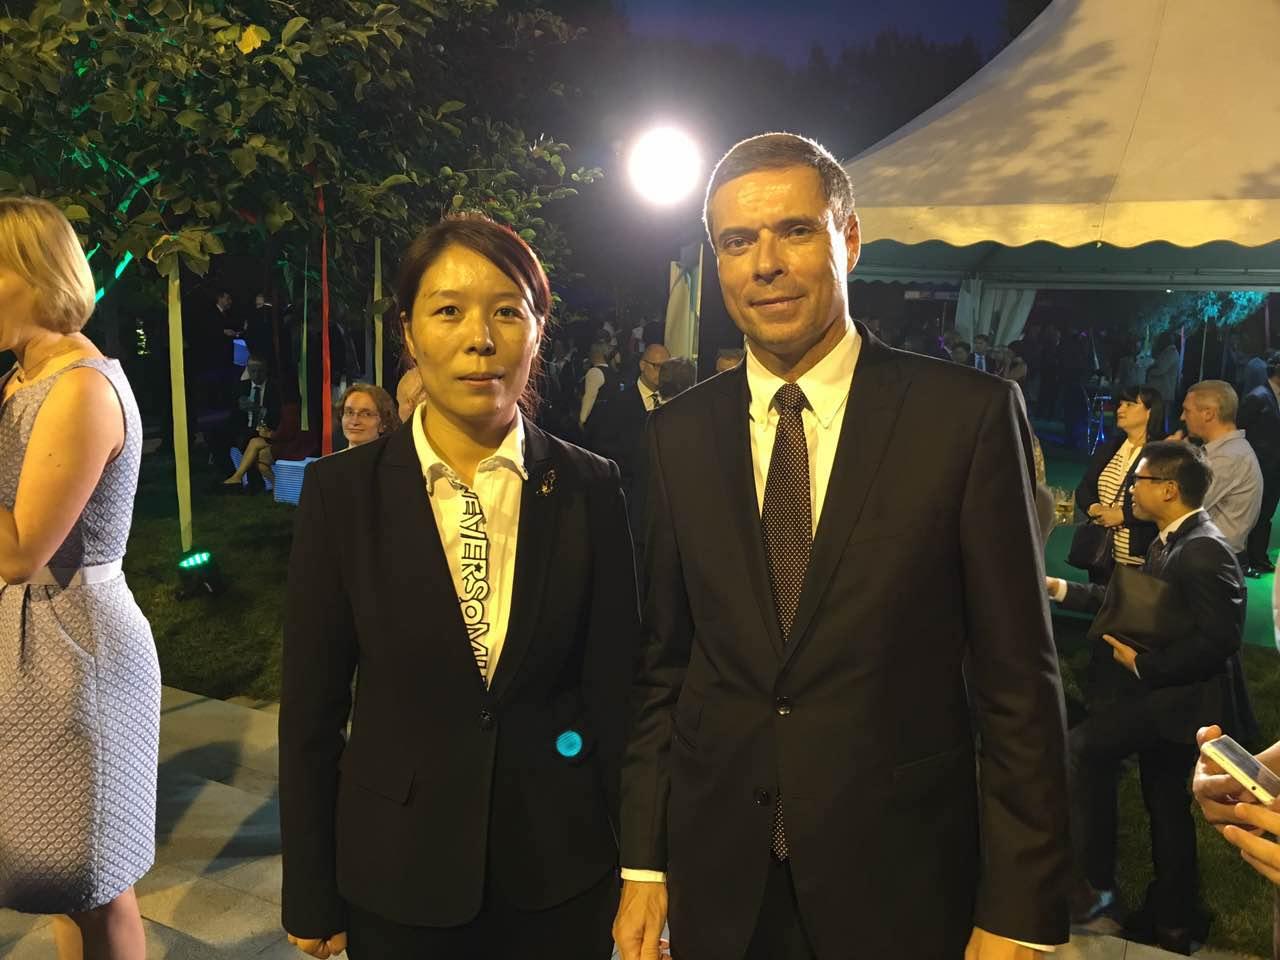 Secretary General Cui Jianghong and the Ambassador H.E. Mr. Michael Christian Max Clauss